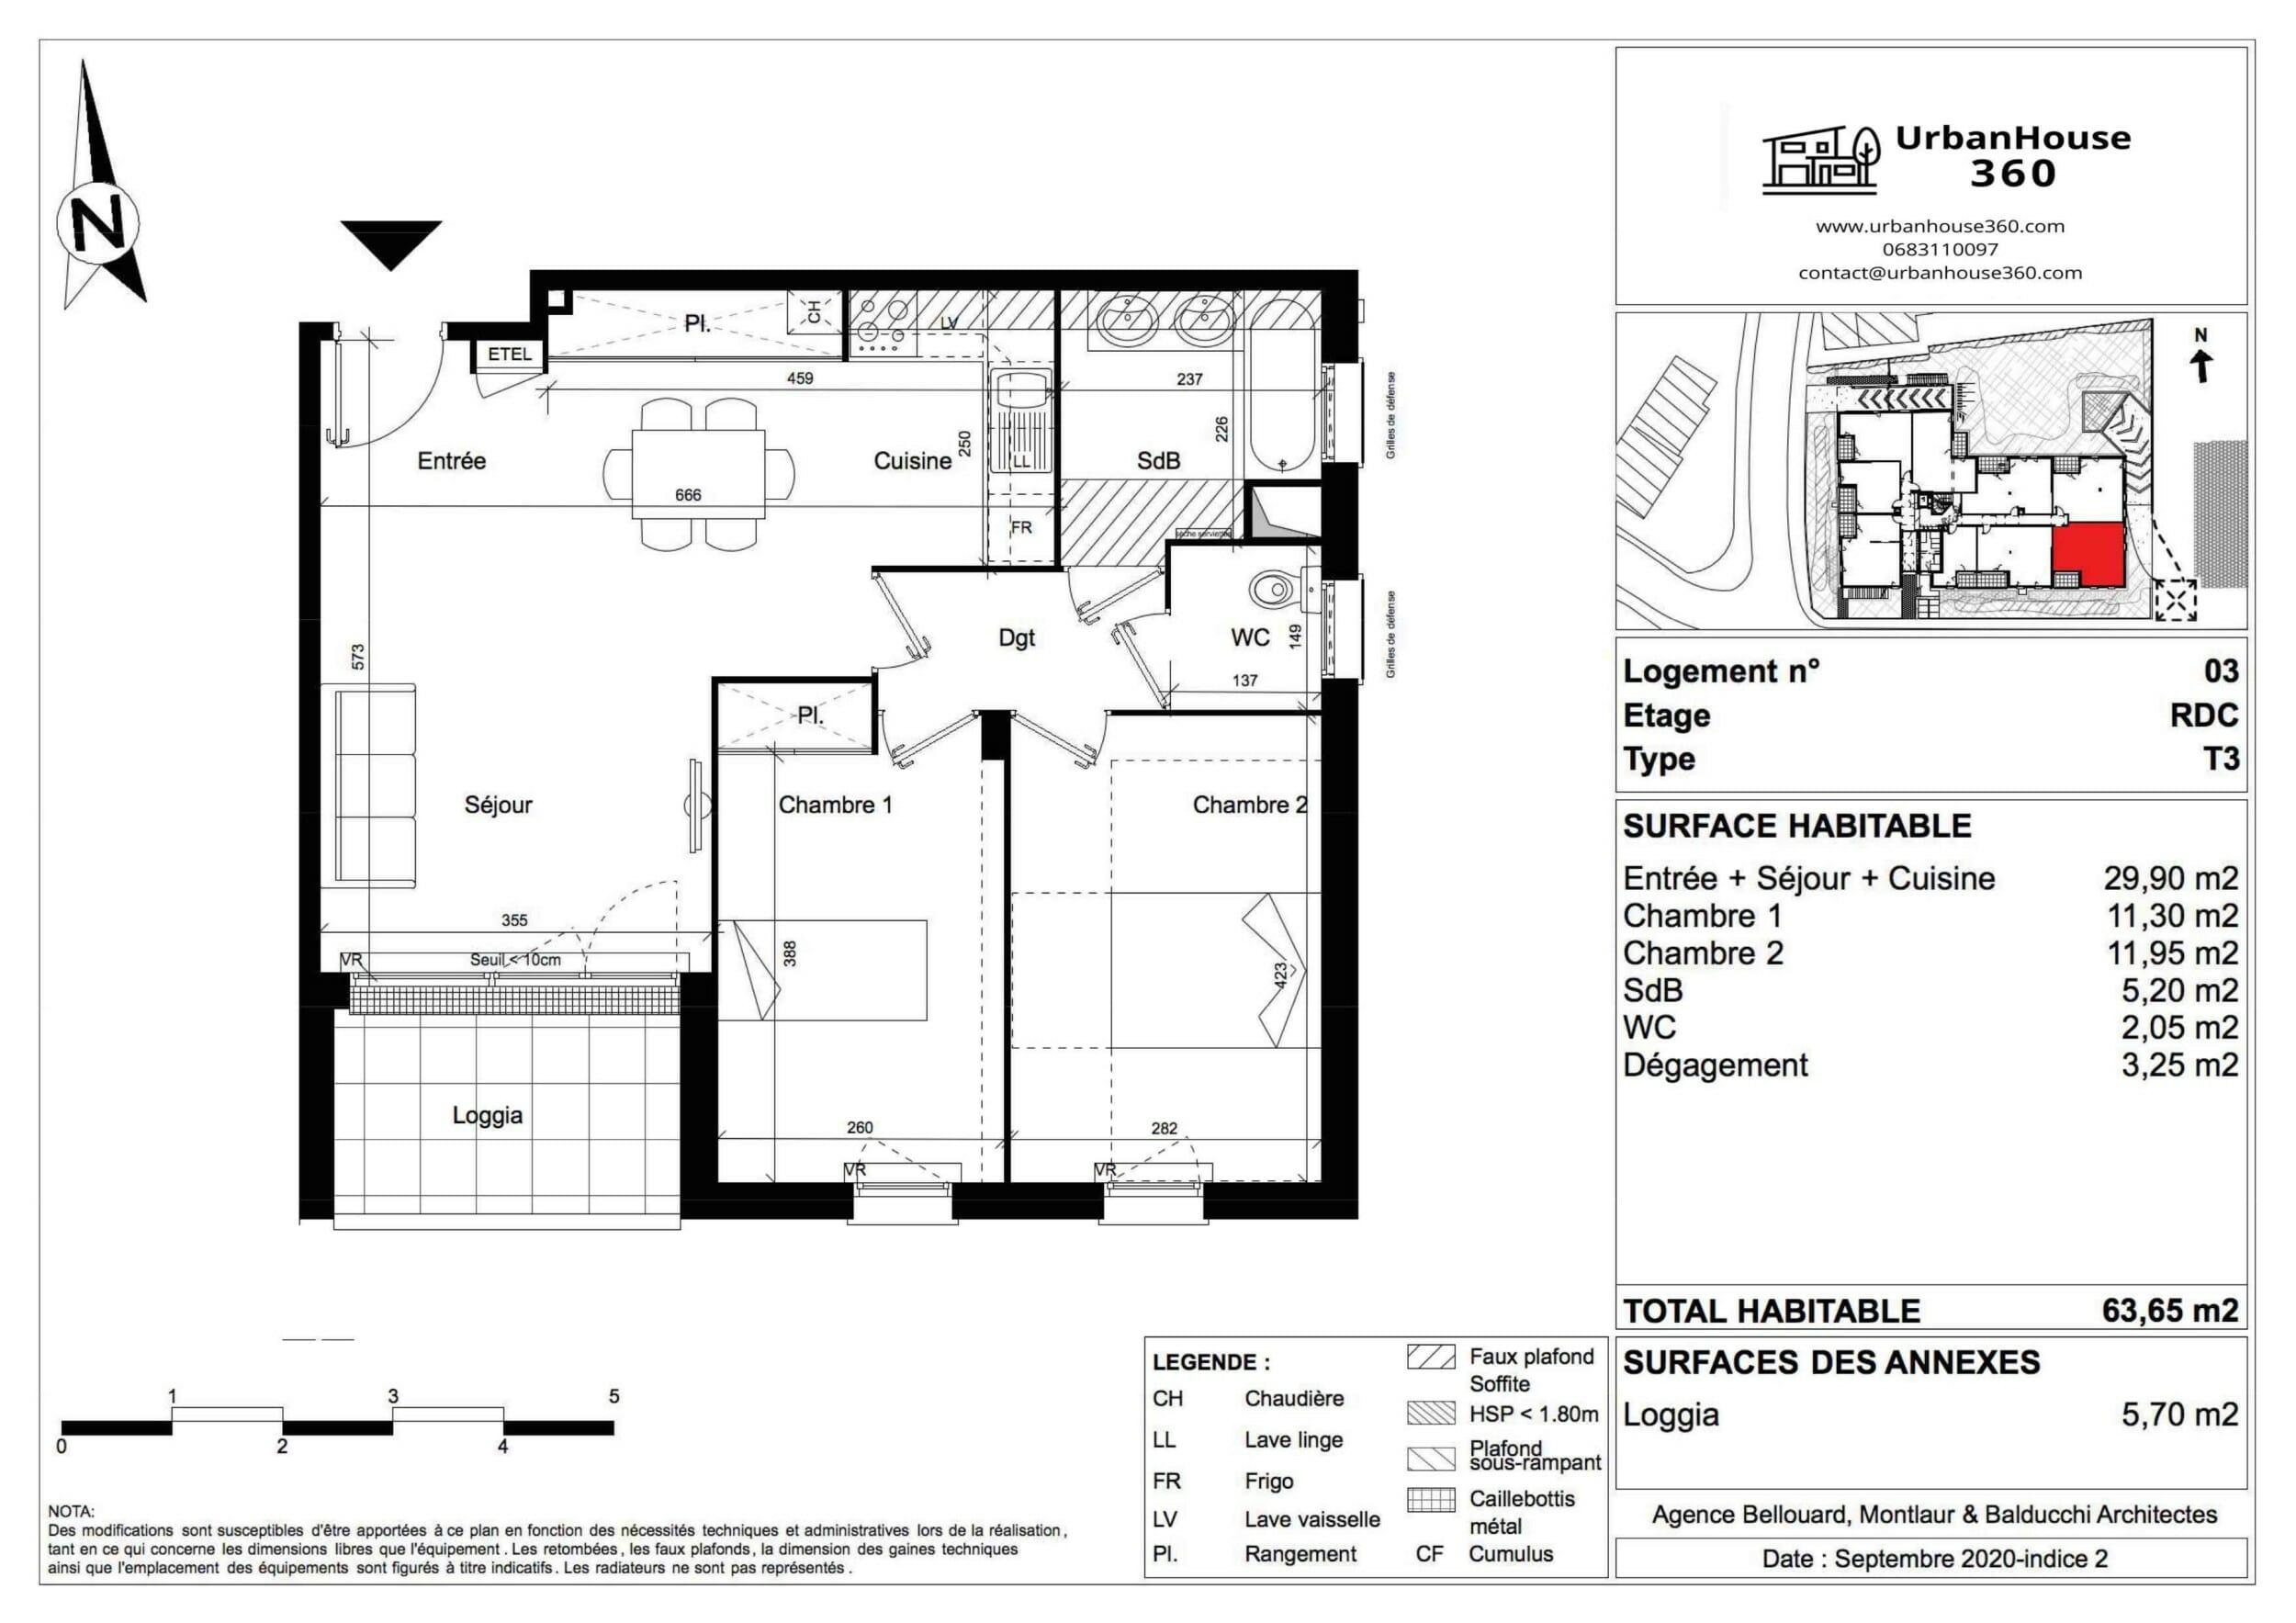 Urbanhouse360-Symphonie-Plan-T3-03-rdc